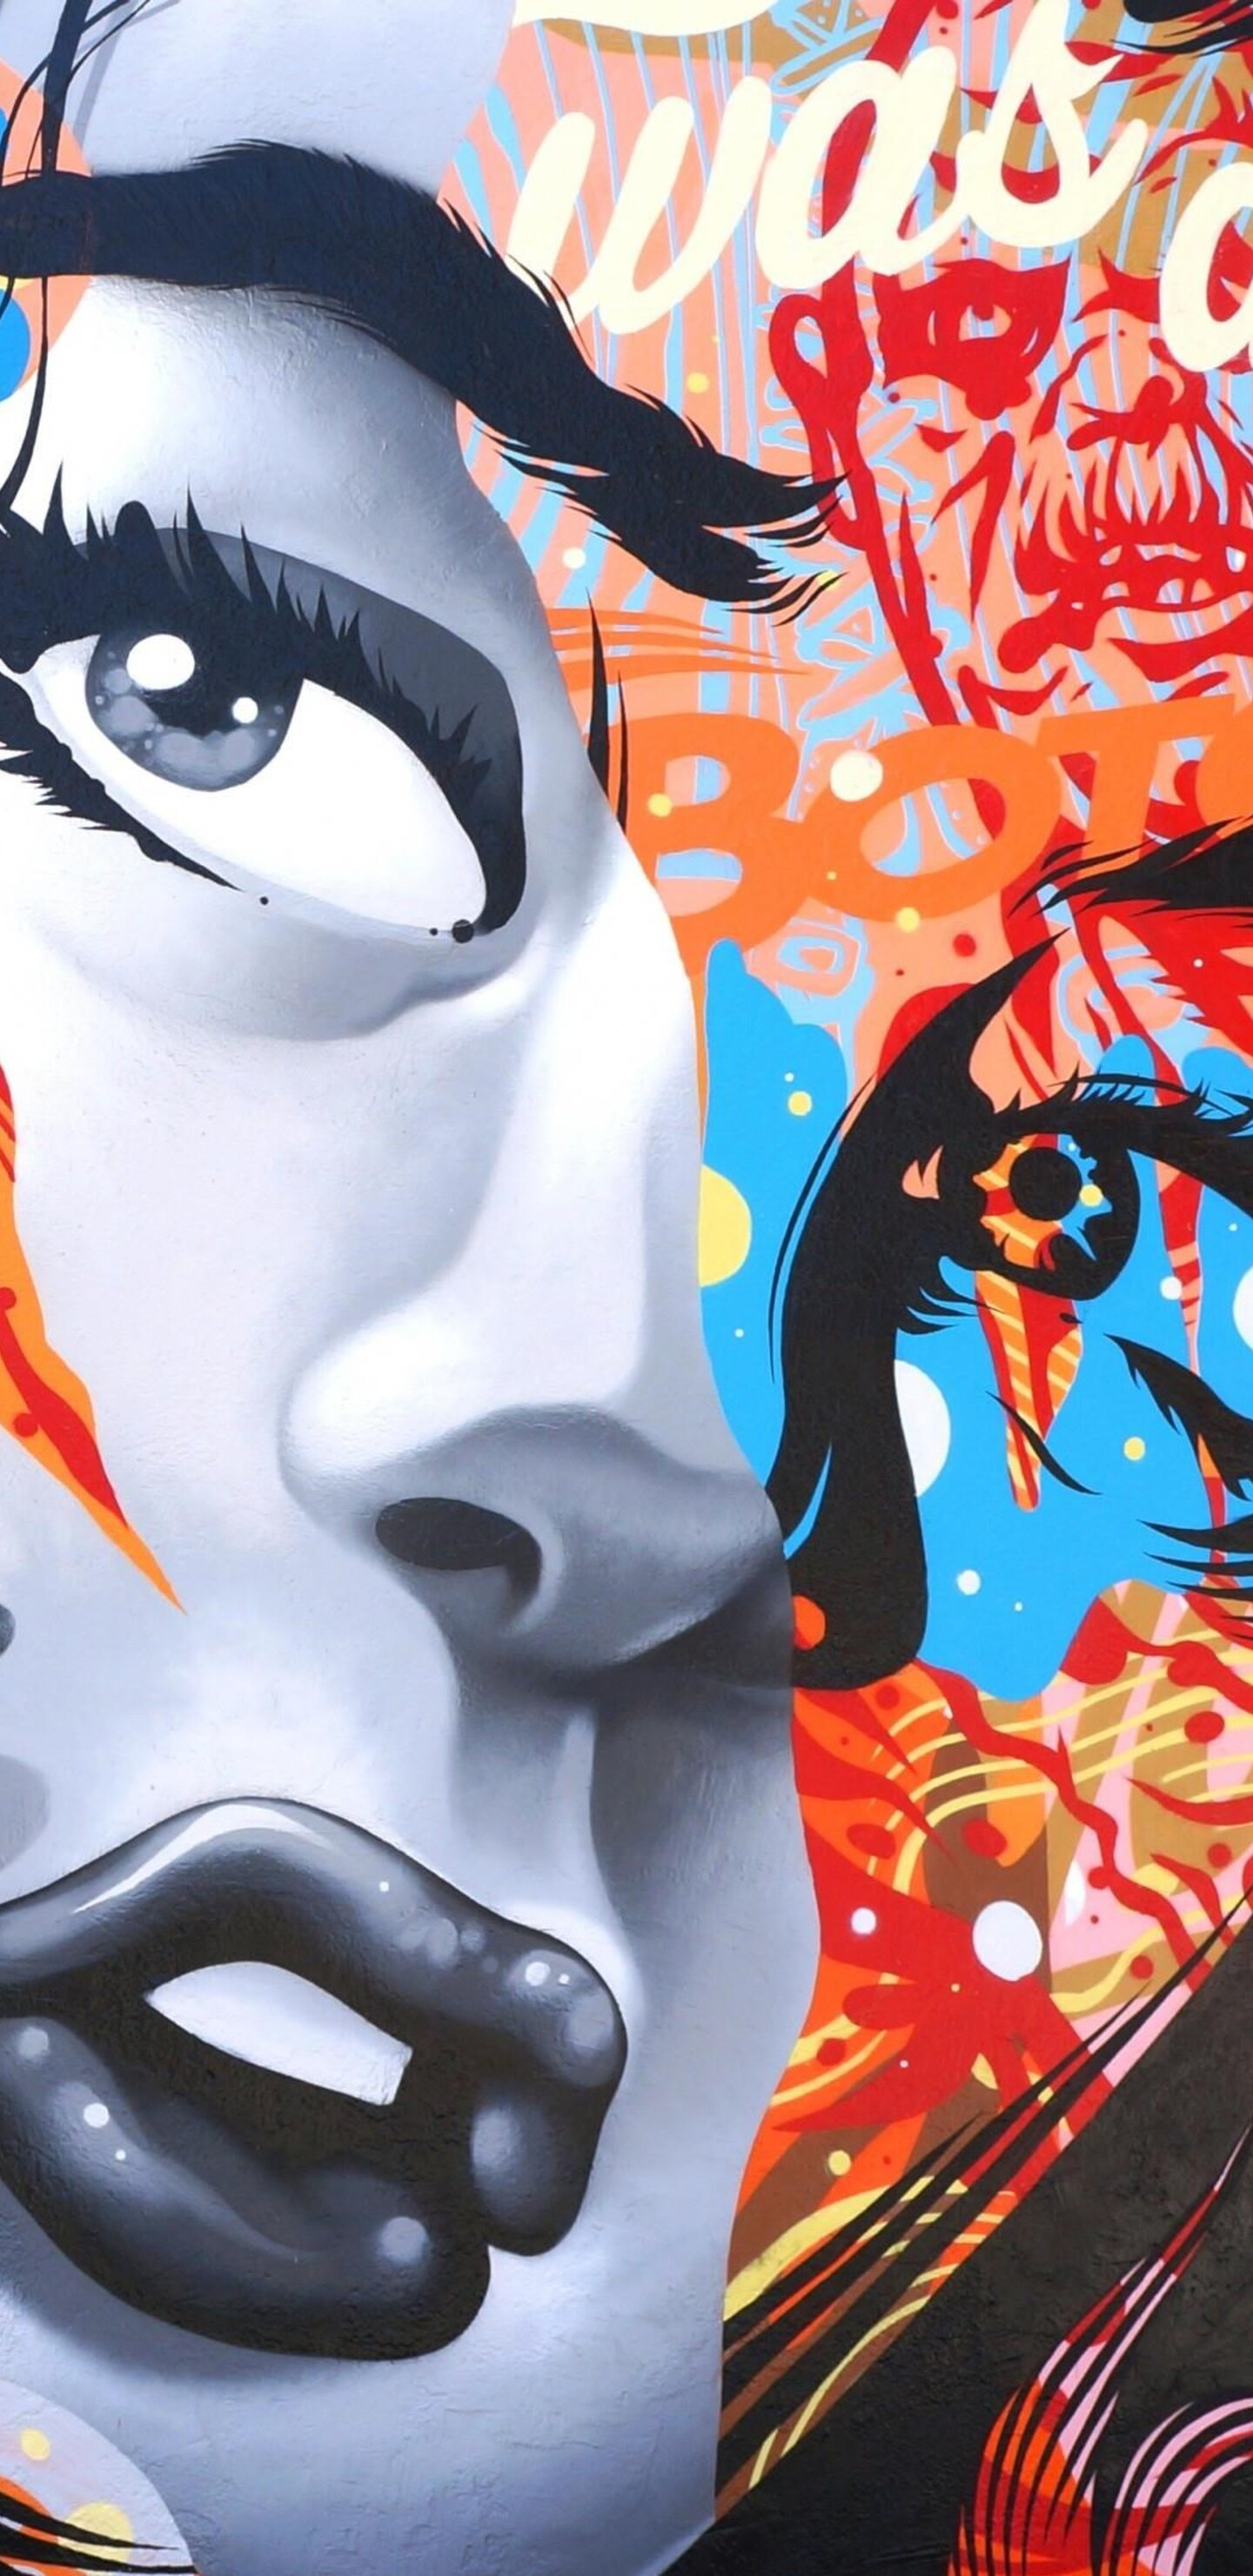 1440x2960 Bioshock Infinite Graffiti Samsung Galaxy Note 9 8 S9 S8